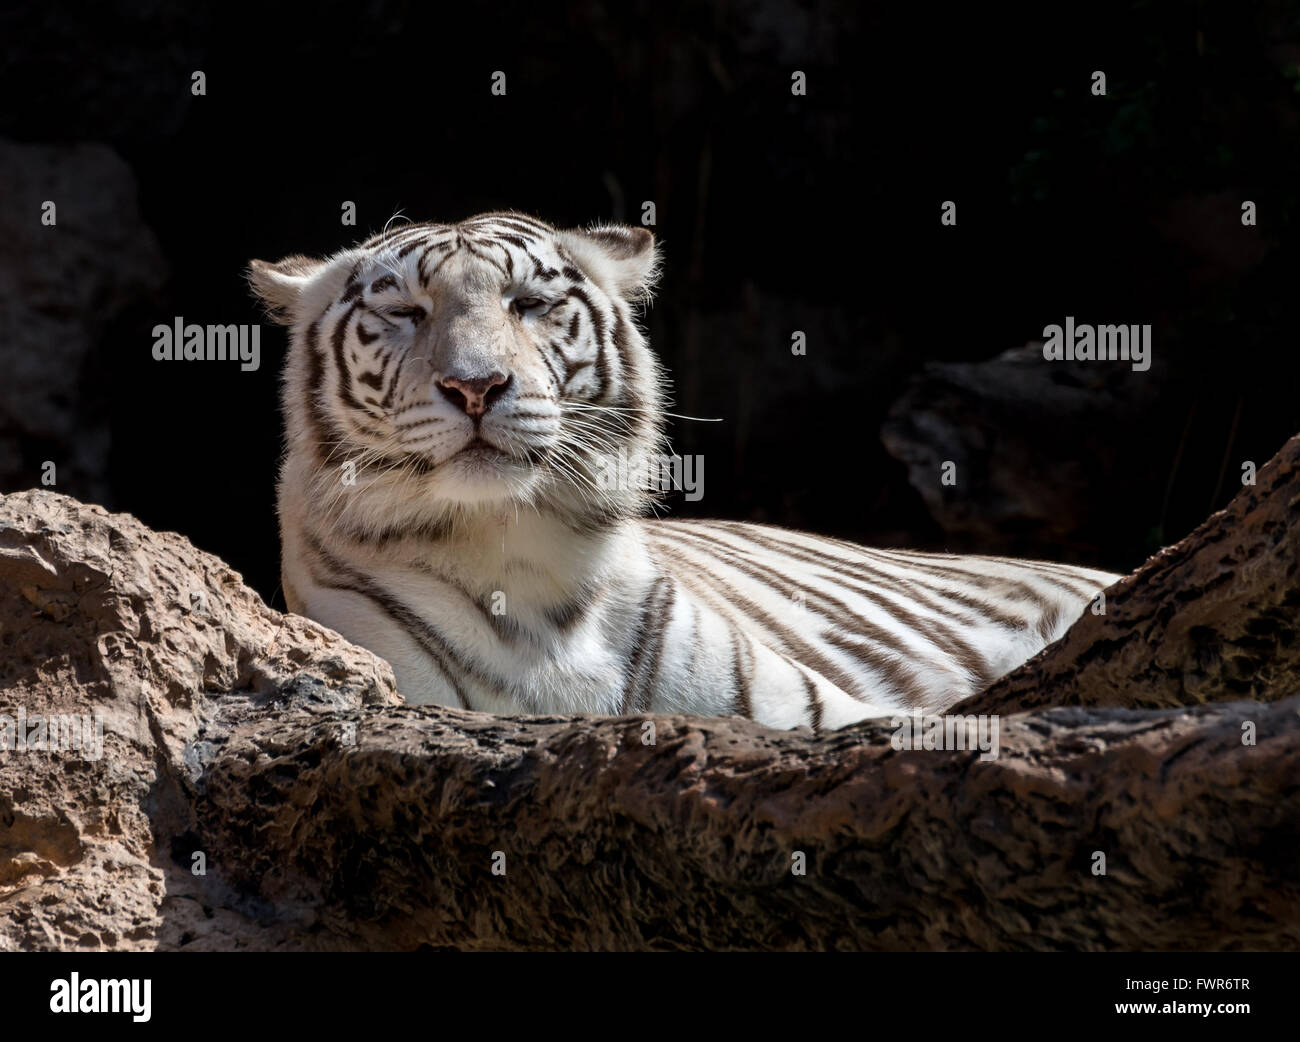 White Bengal Tiger Lying down - Stock Image